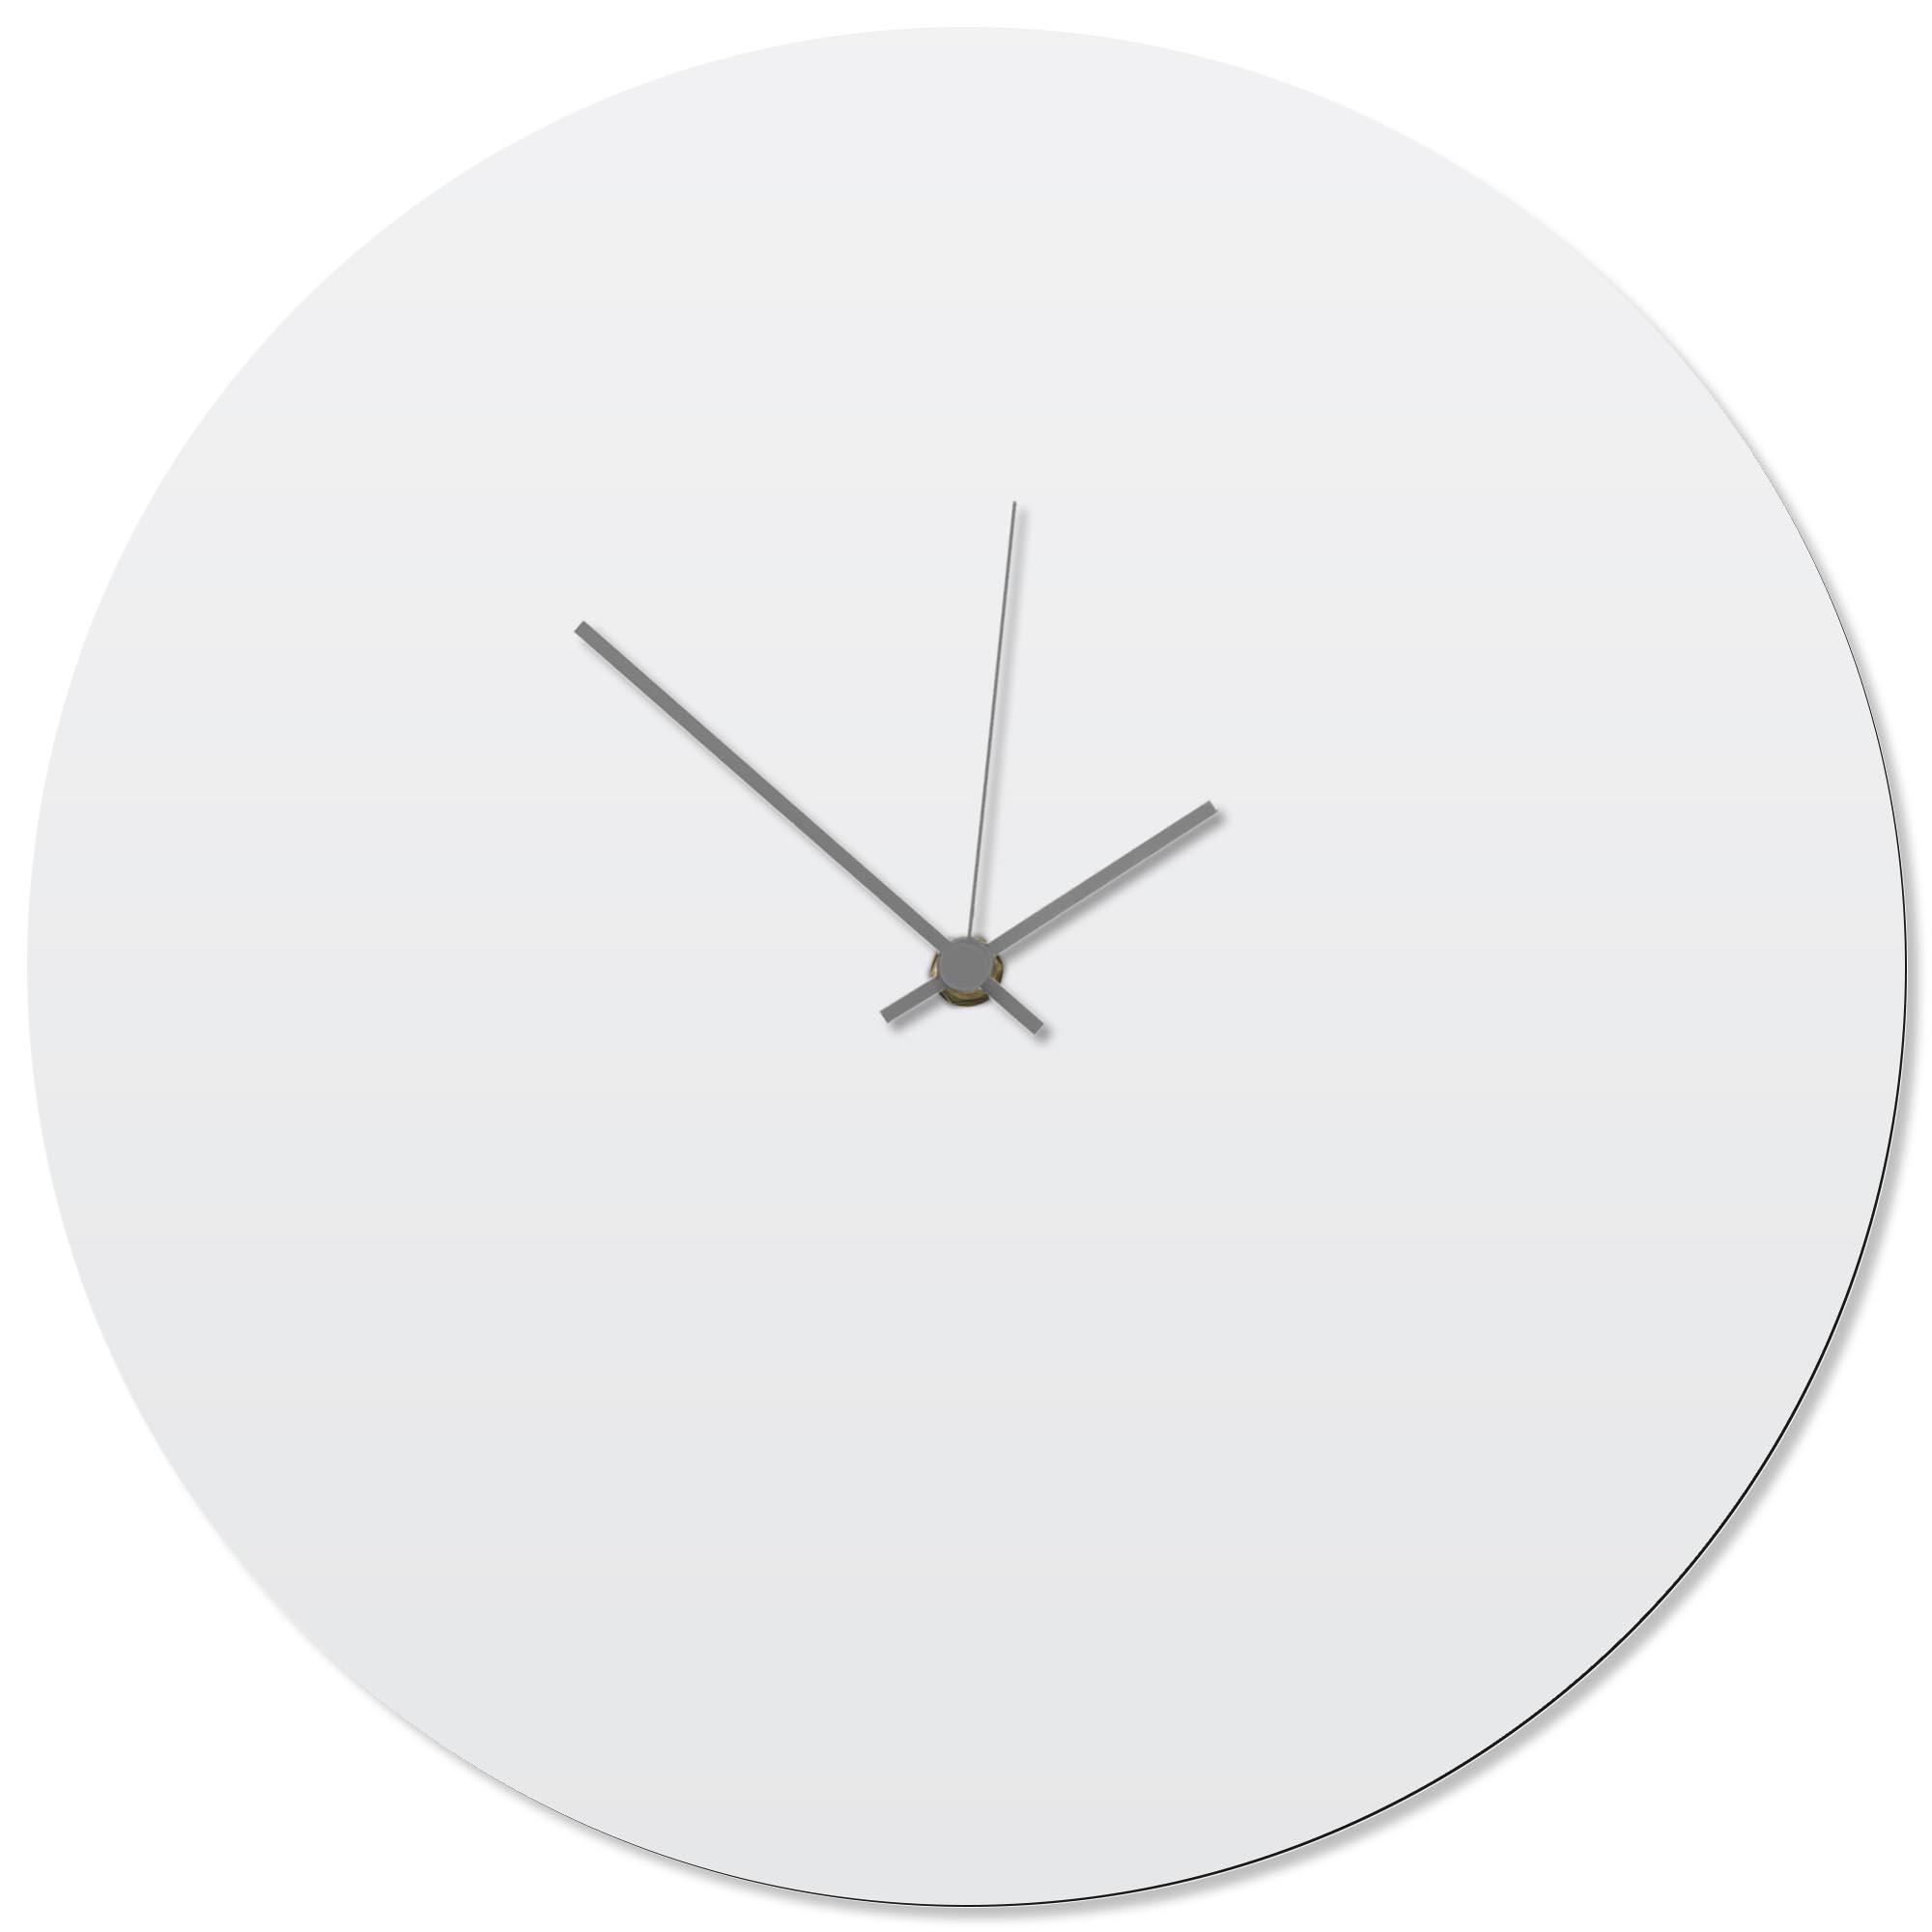 Whiteout Grey Circle Clock 16x16in. Aluminum Polymetal